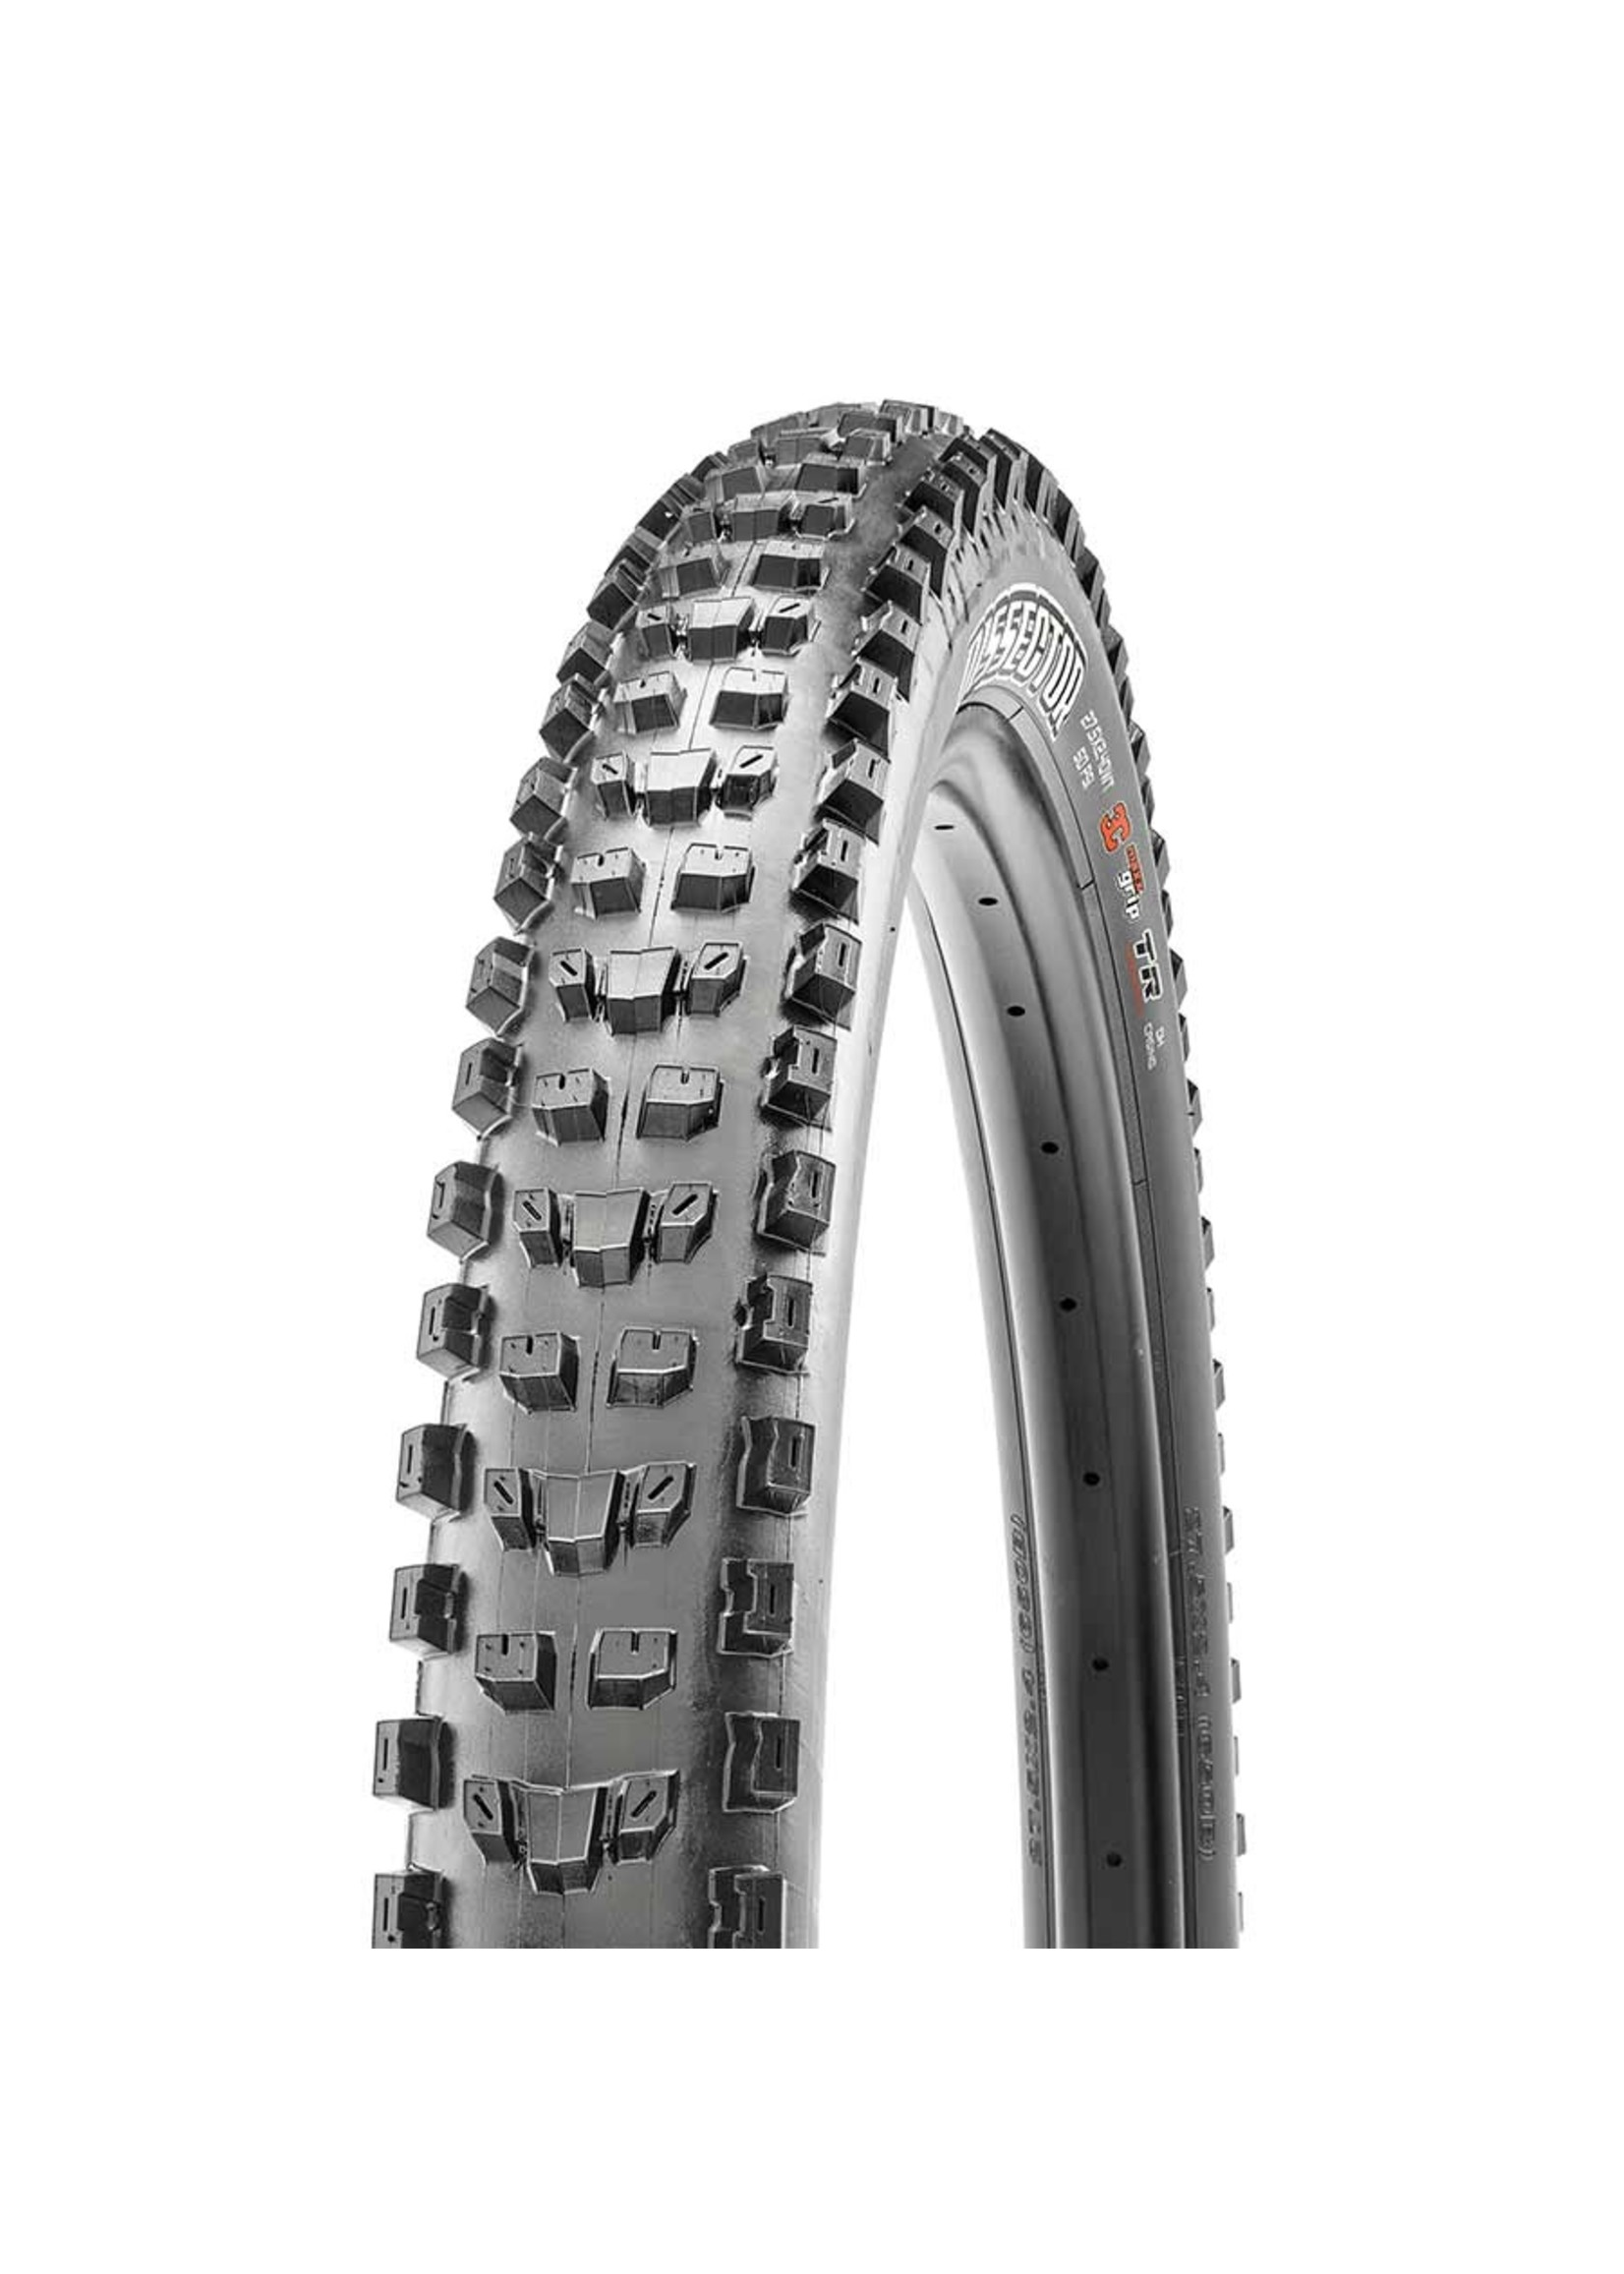 Maxxis Maxxis , Dissector, Tire, 27.5''x2.40, Folding, Tubeless Ready, 3C Maxx Terra, EXO+, Wide Trail, 120TPI, Black